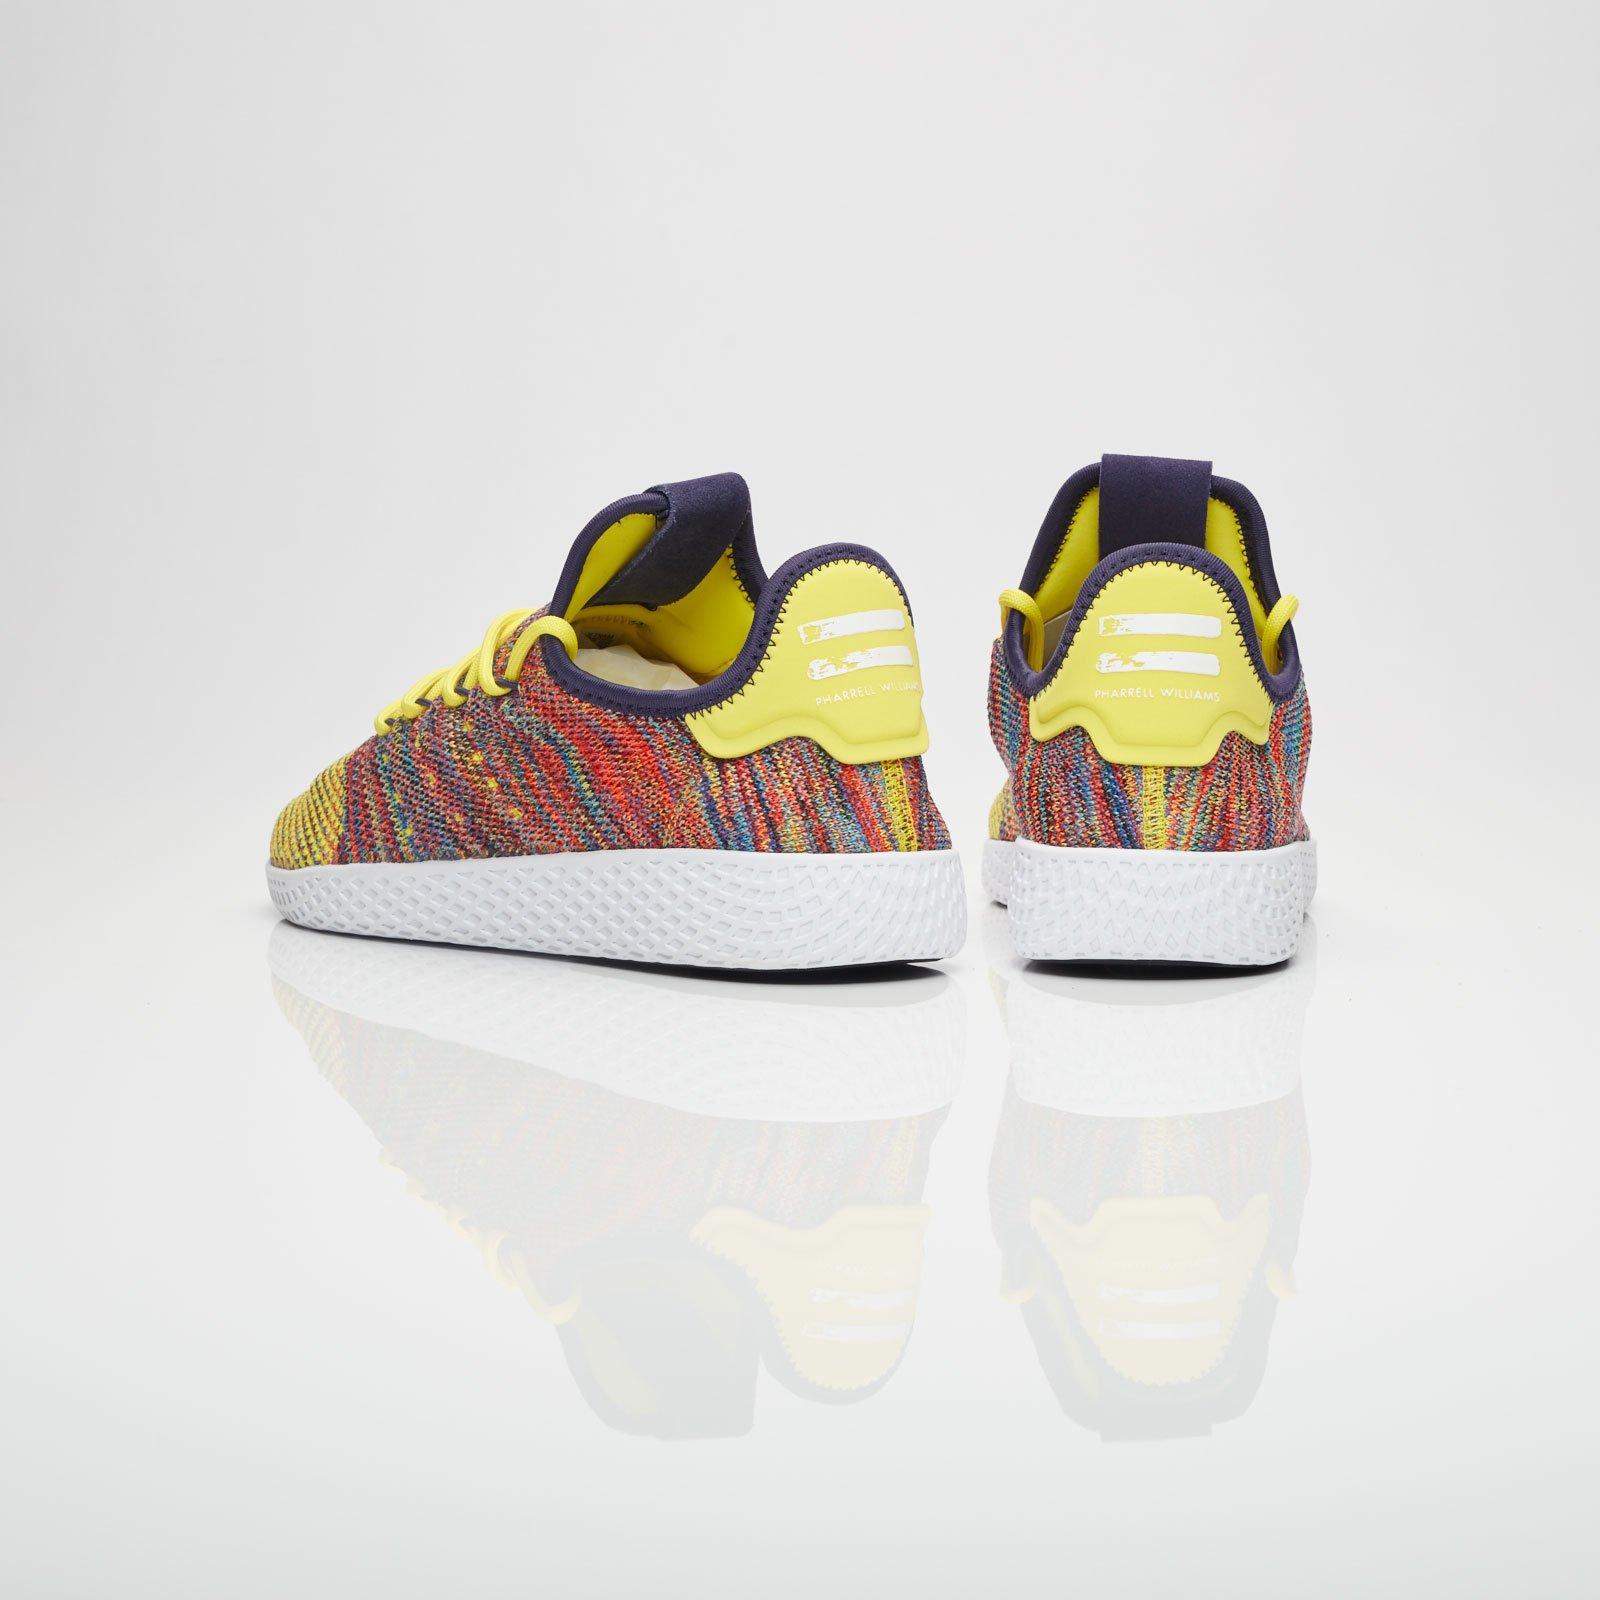 04b7e33960057 adidas PW Tennis HU - By2673 - Sneakersnstuff